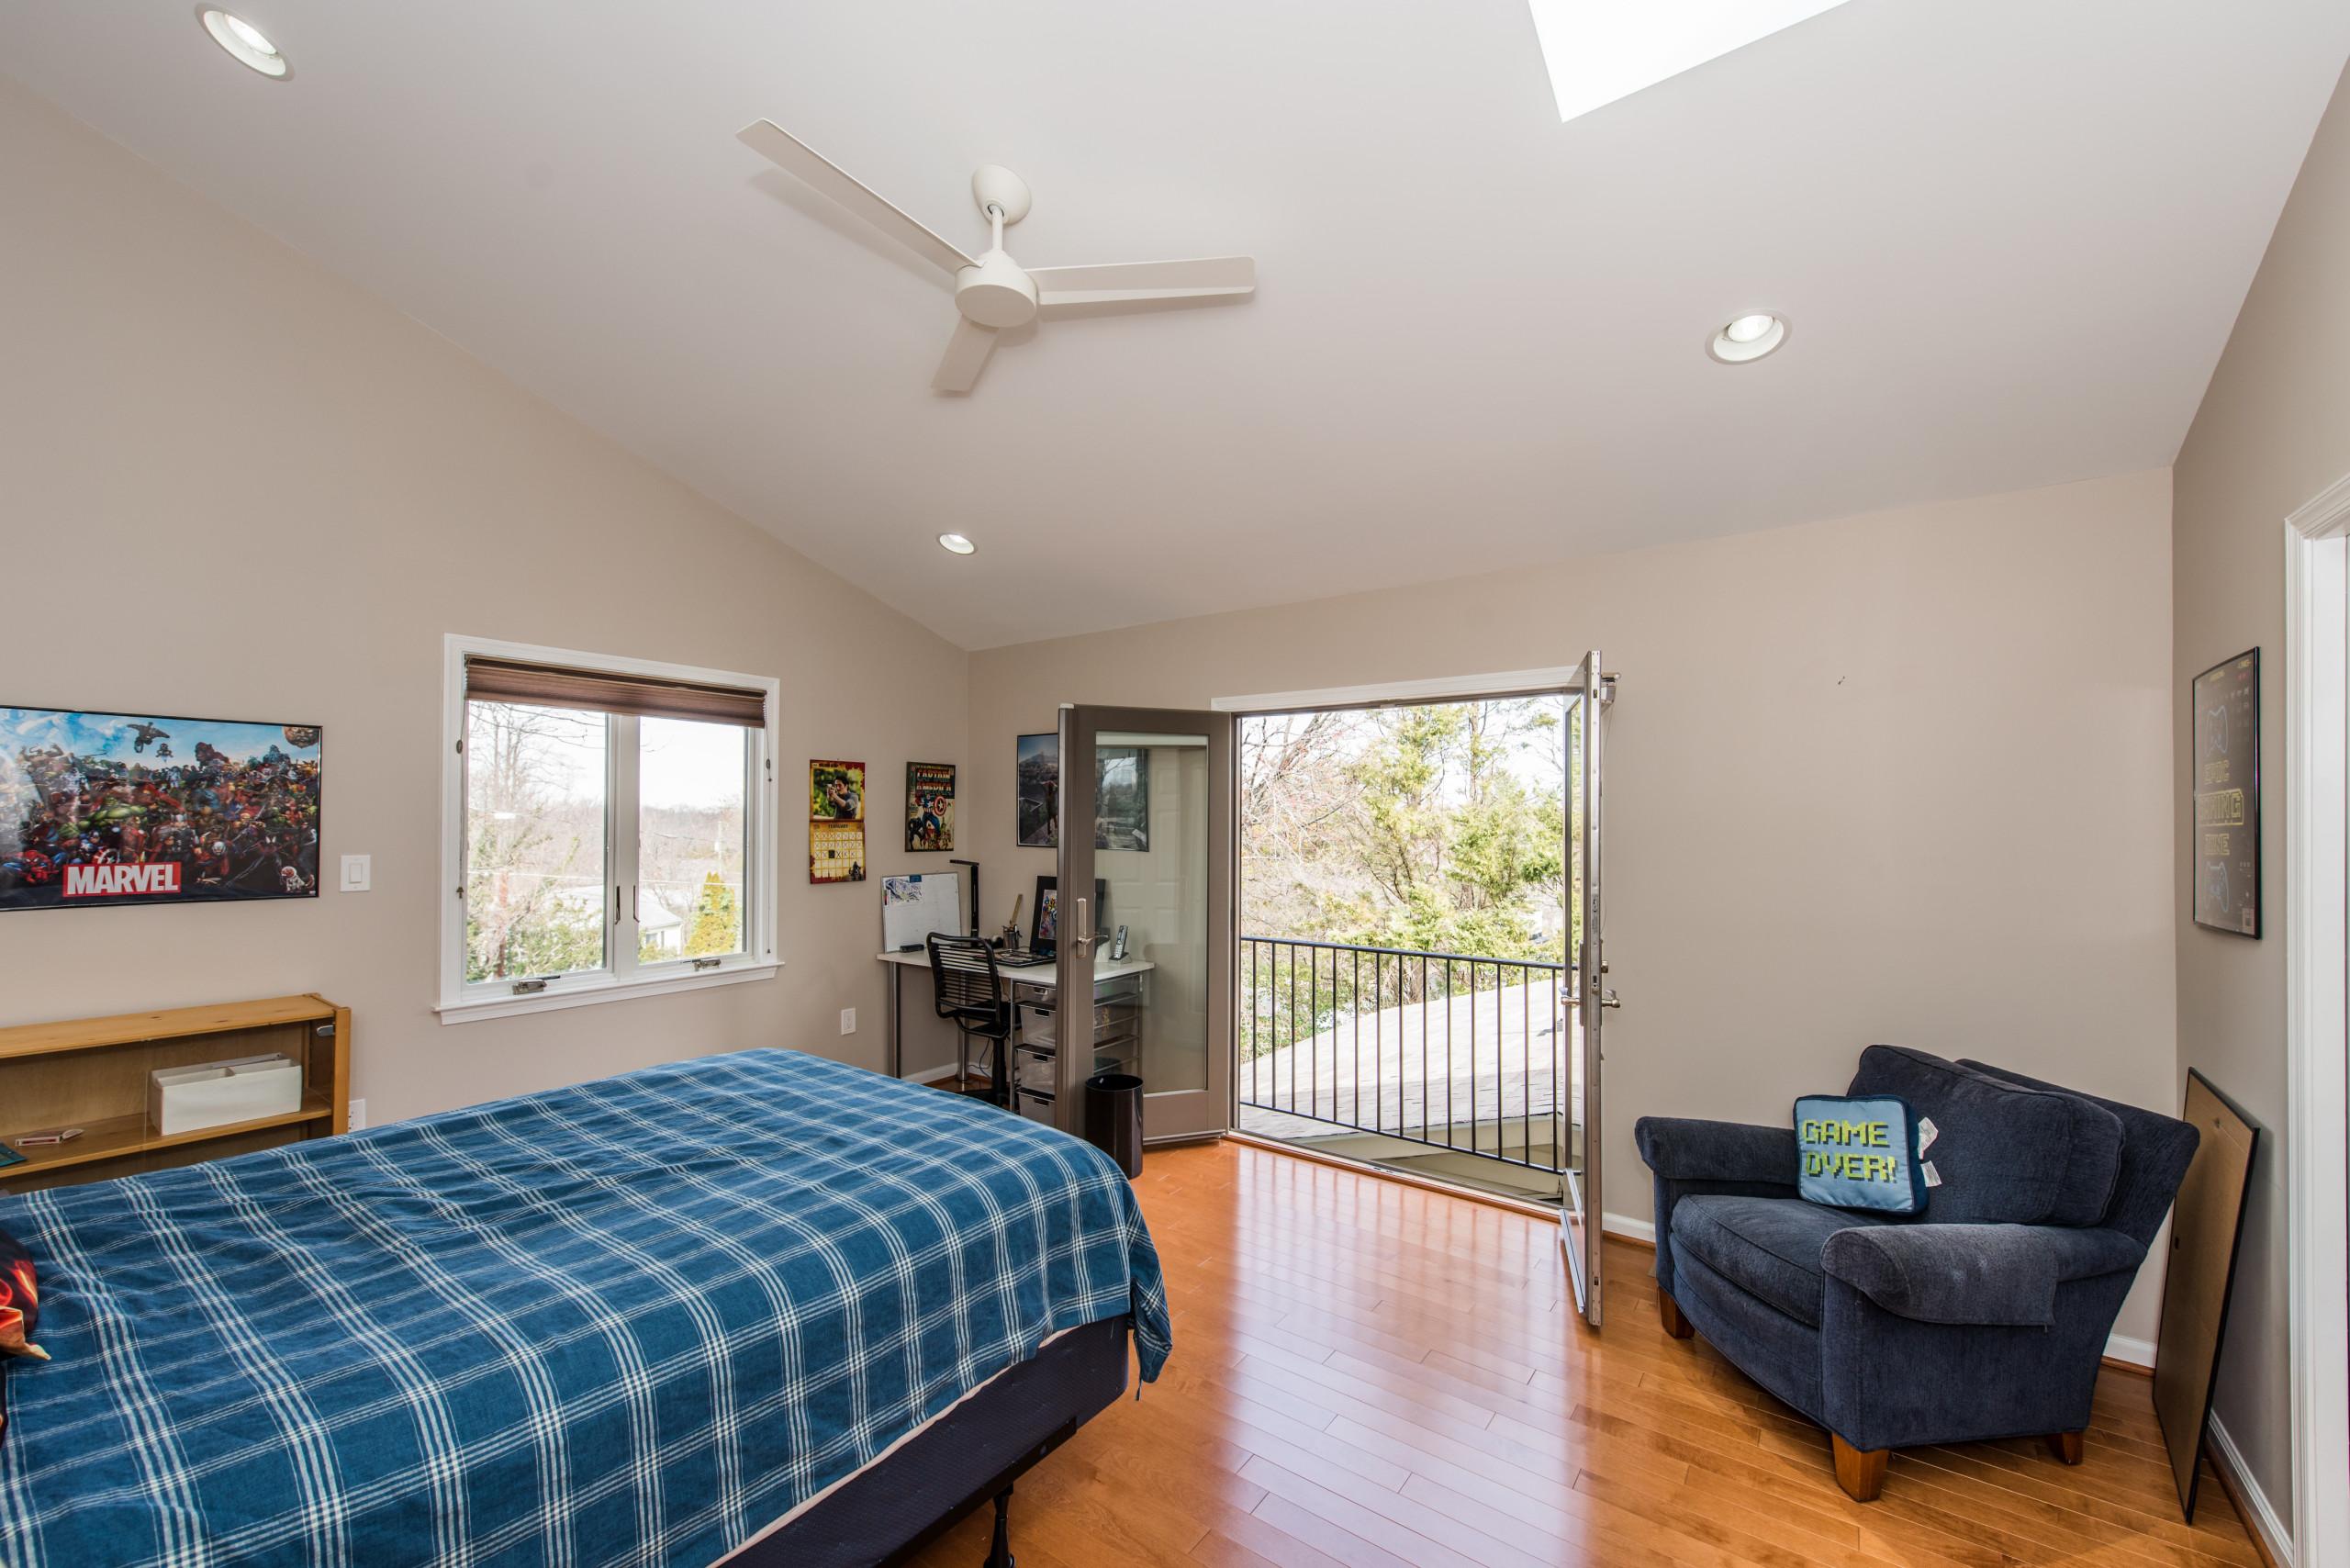 Home Remodel in McLean, VA